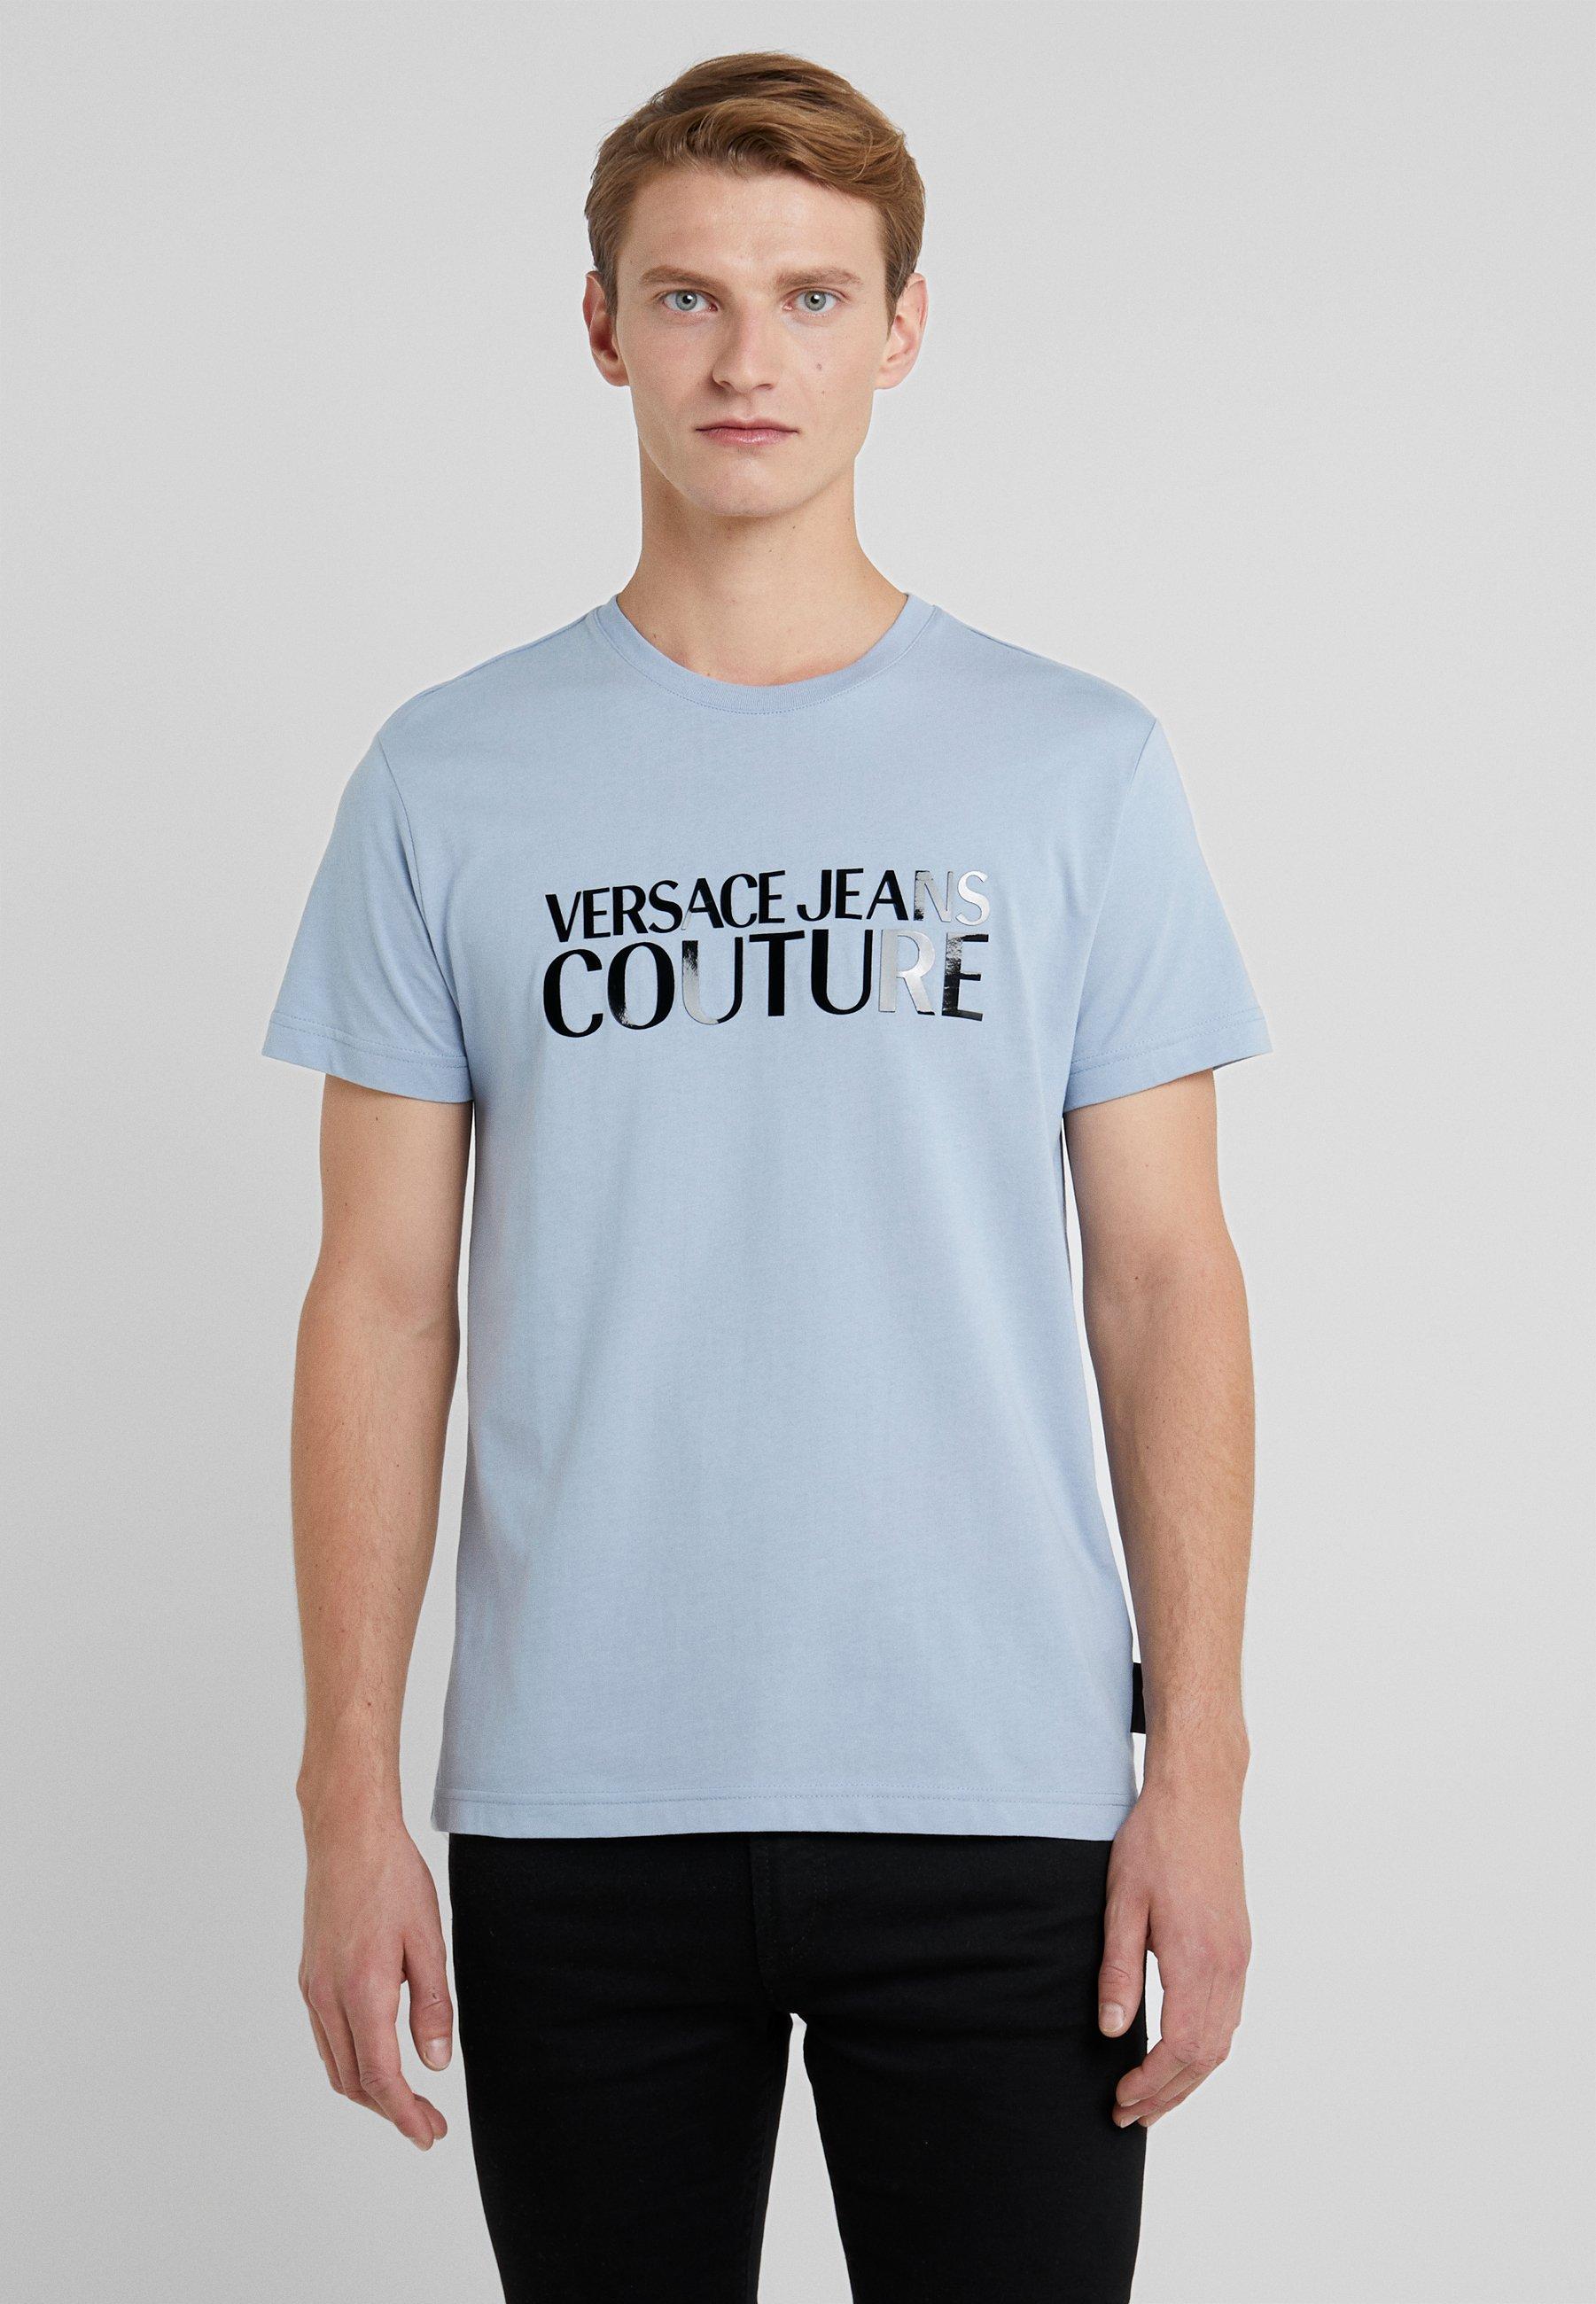 shirt Aviatore Jeans Couture Imprimé Versace MaglietteT CorxBedW